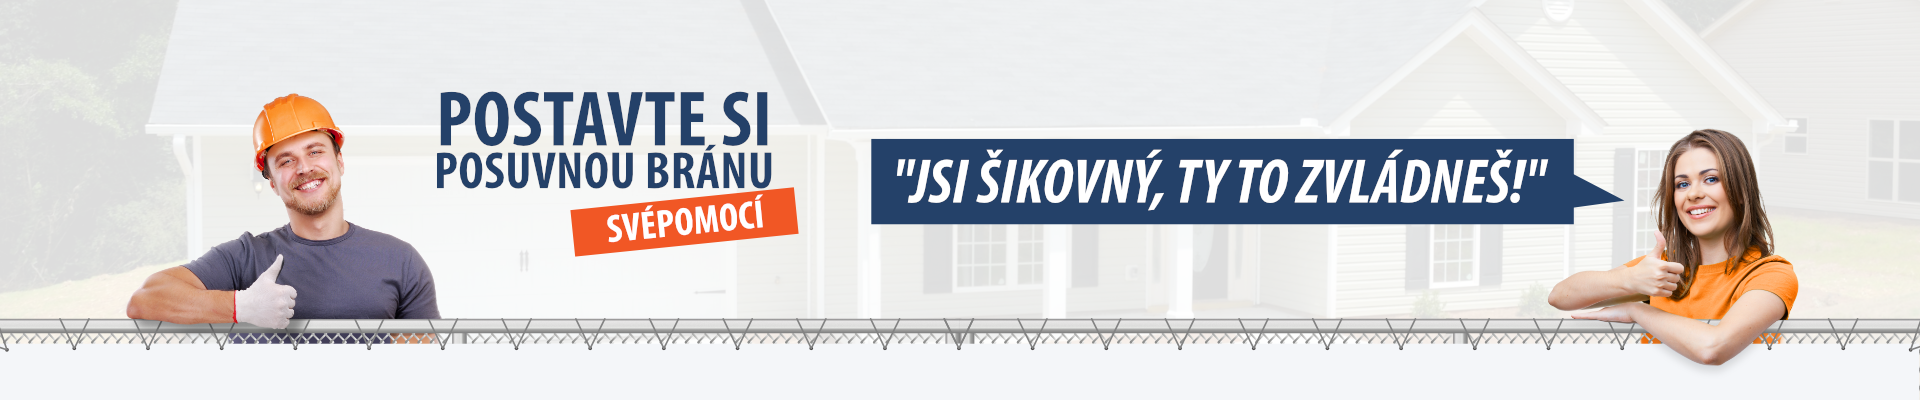 Banner - jsi-sikovny-ty-to-zvladnes-1554191715.png